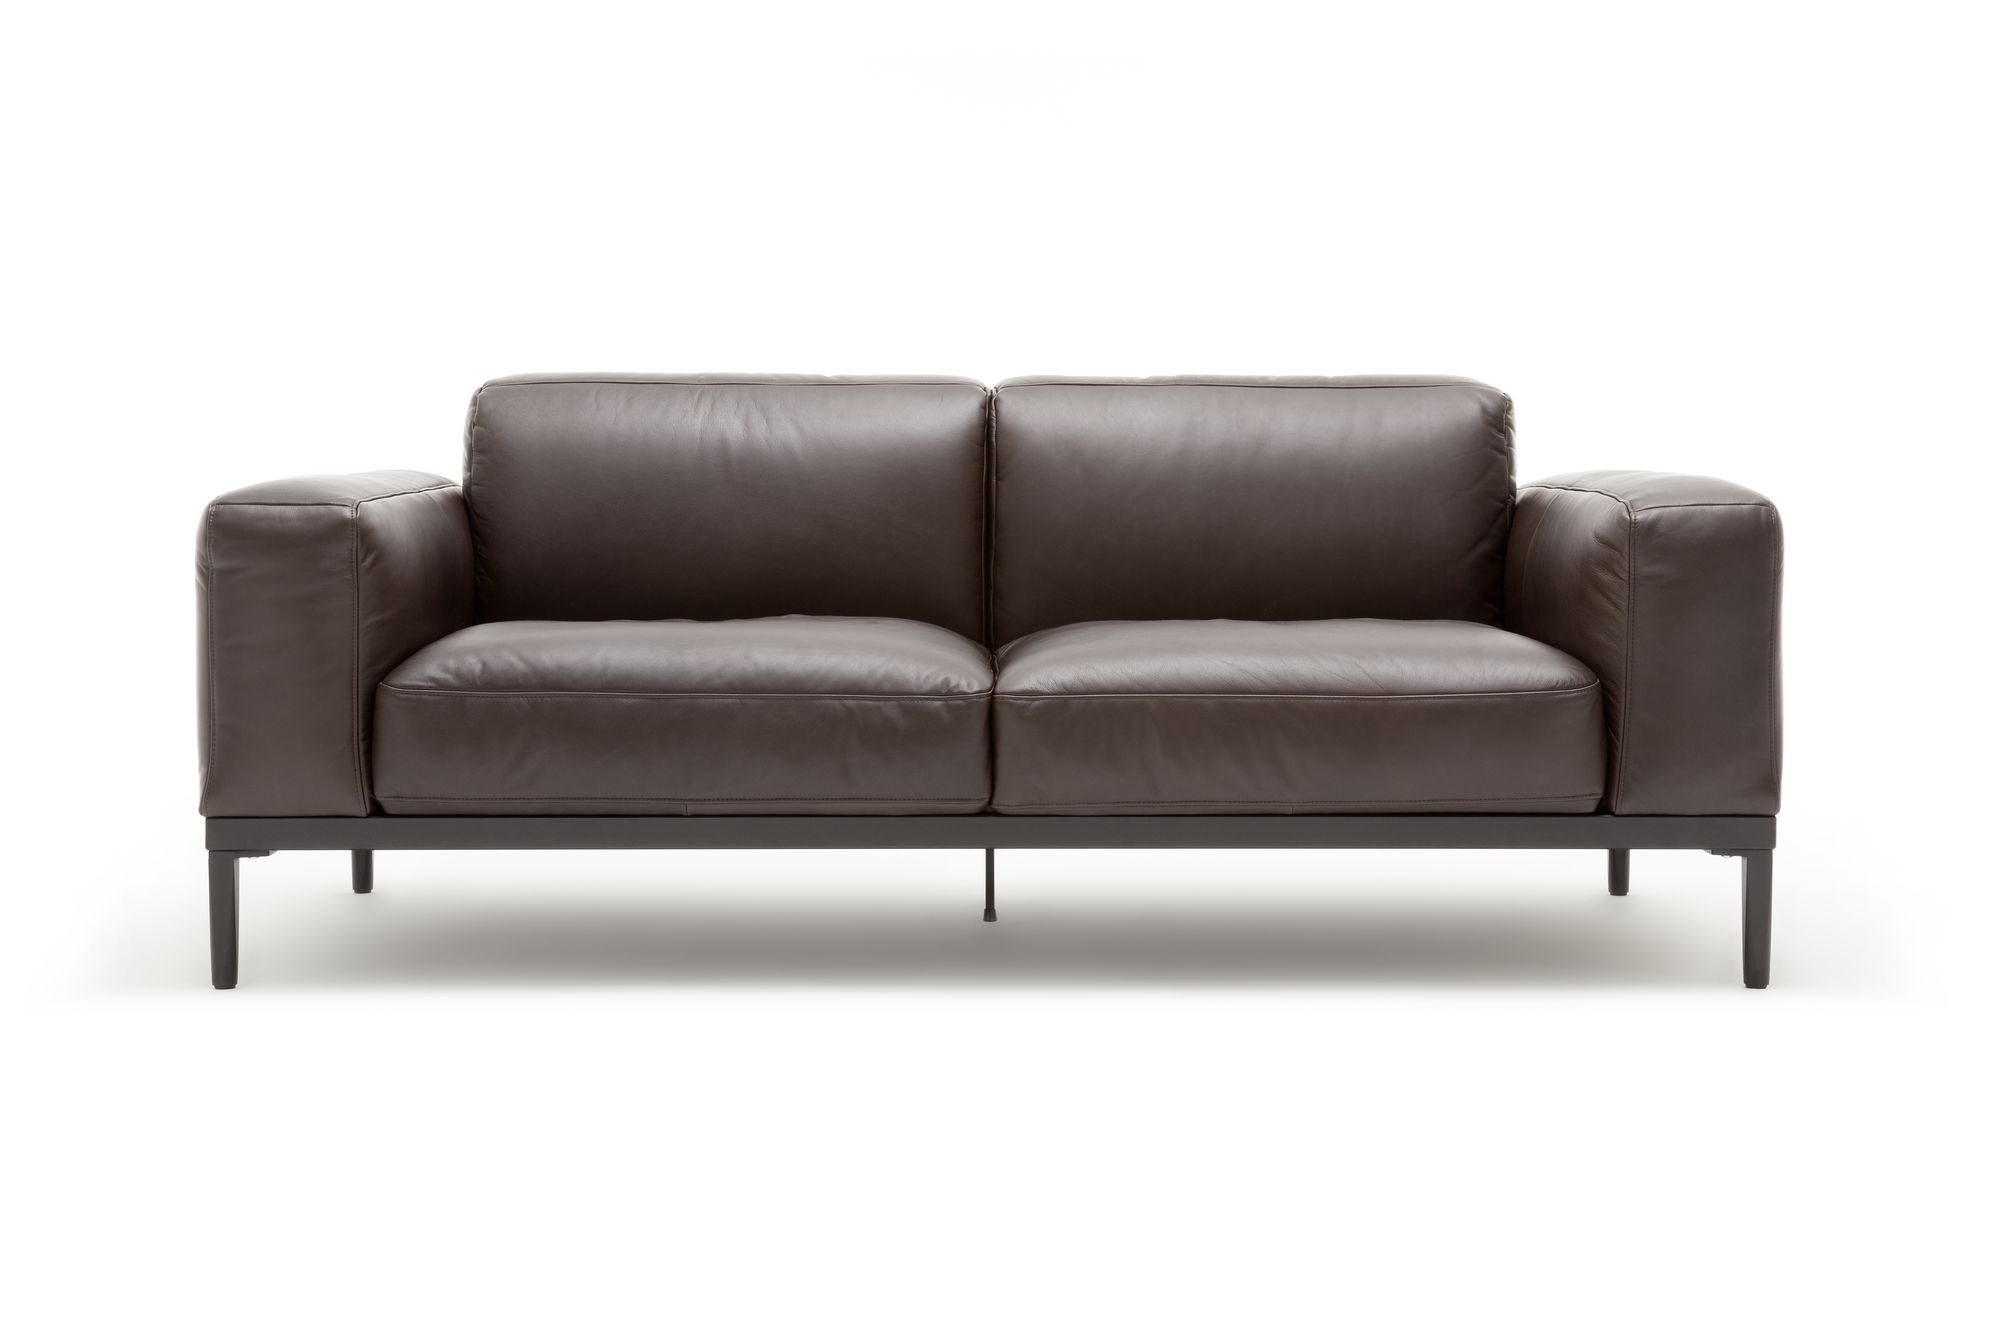 freistil 167 rolf benz sofa im dunkelbraunen leder freistil rolf benz sofas freistil rolf. Black Bedroom Furniture Sets. Home Design Ideas